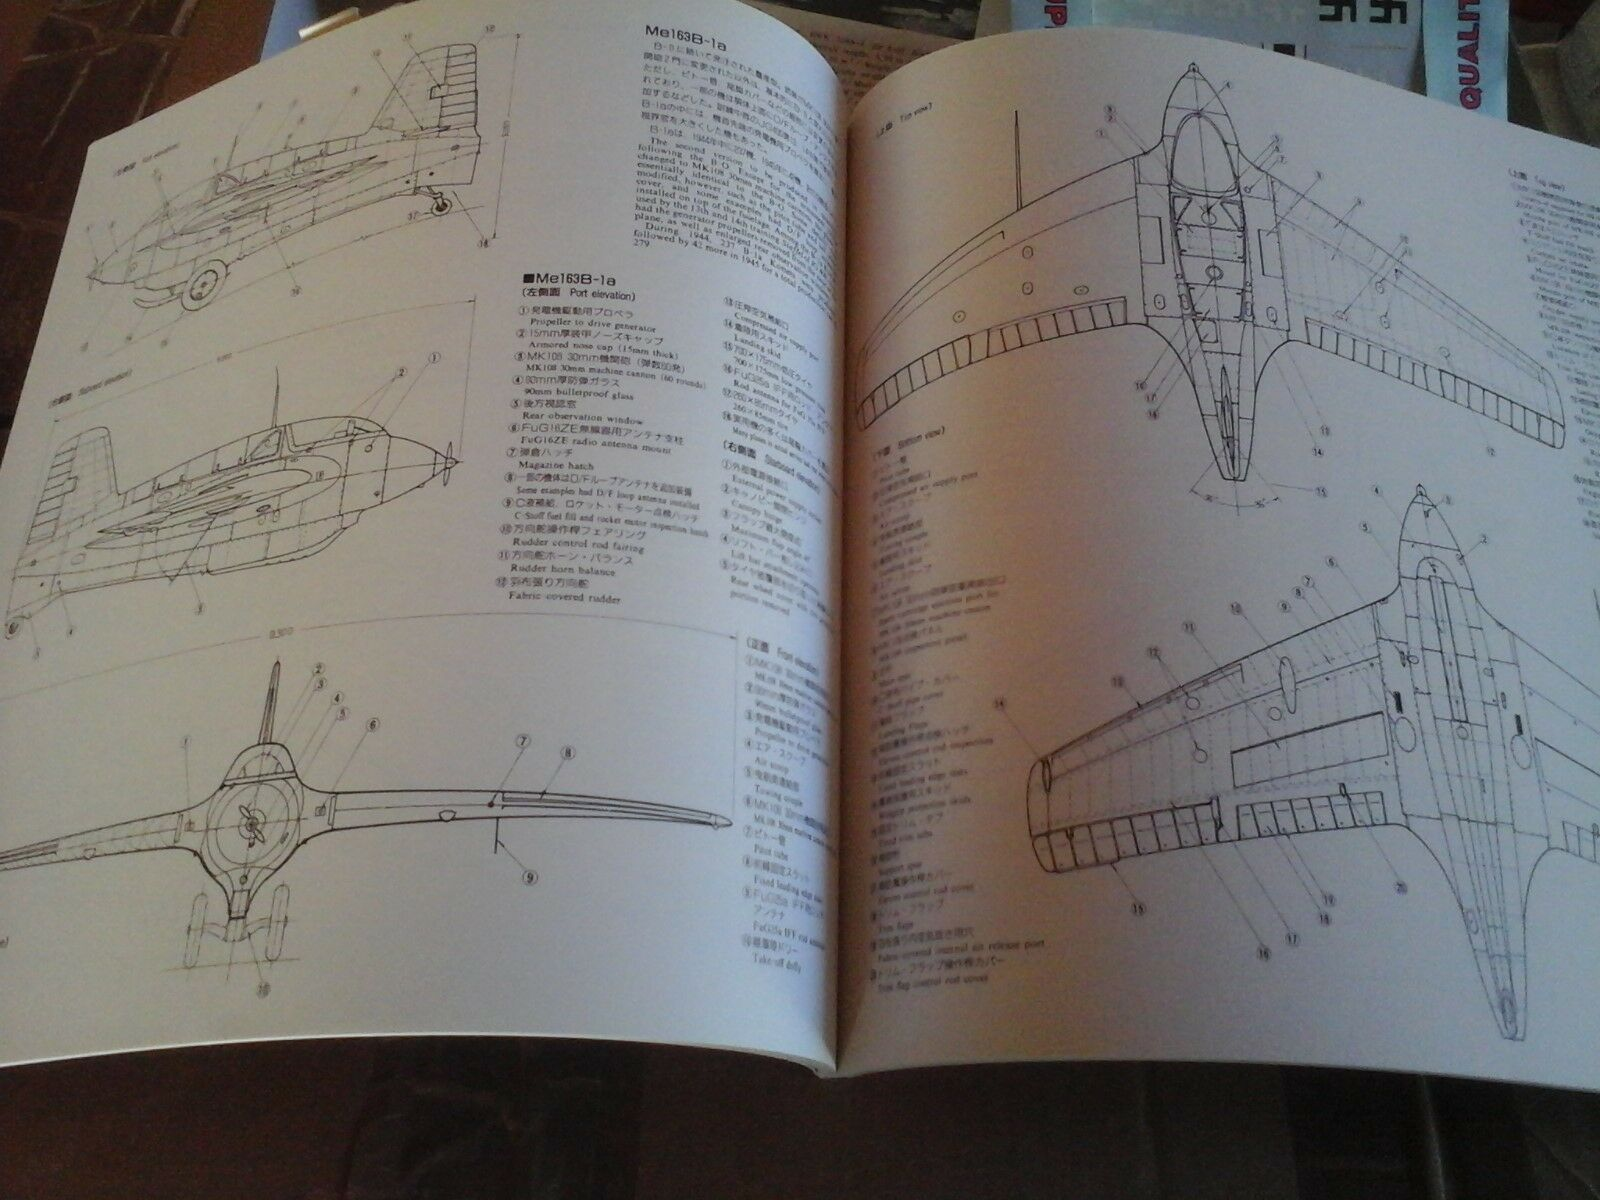 AERO DETAIL N.10 MESSERCHMITT MESSERCHMITT MESSERCHMITT ME163B KOMET & HEINKEL HE 162-BY SHIGERU NOHARA- 454812